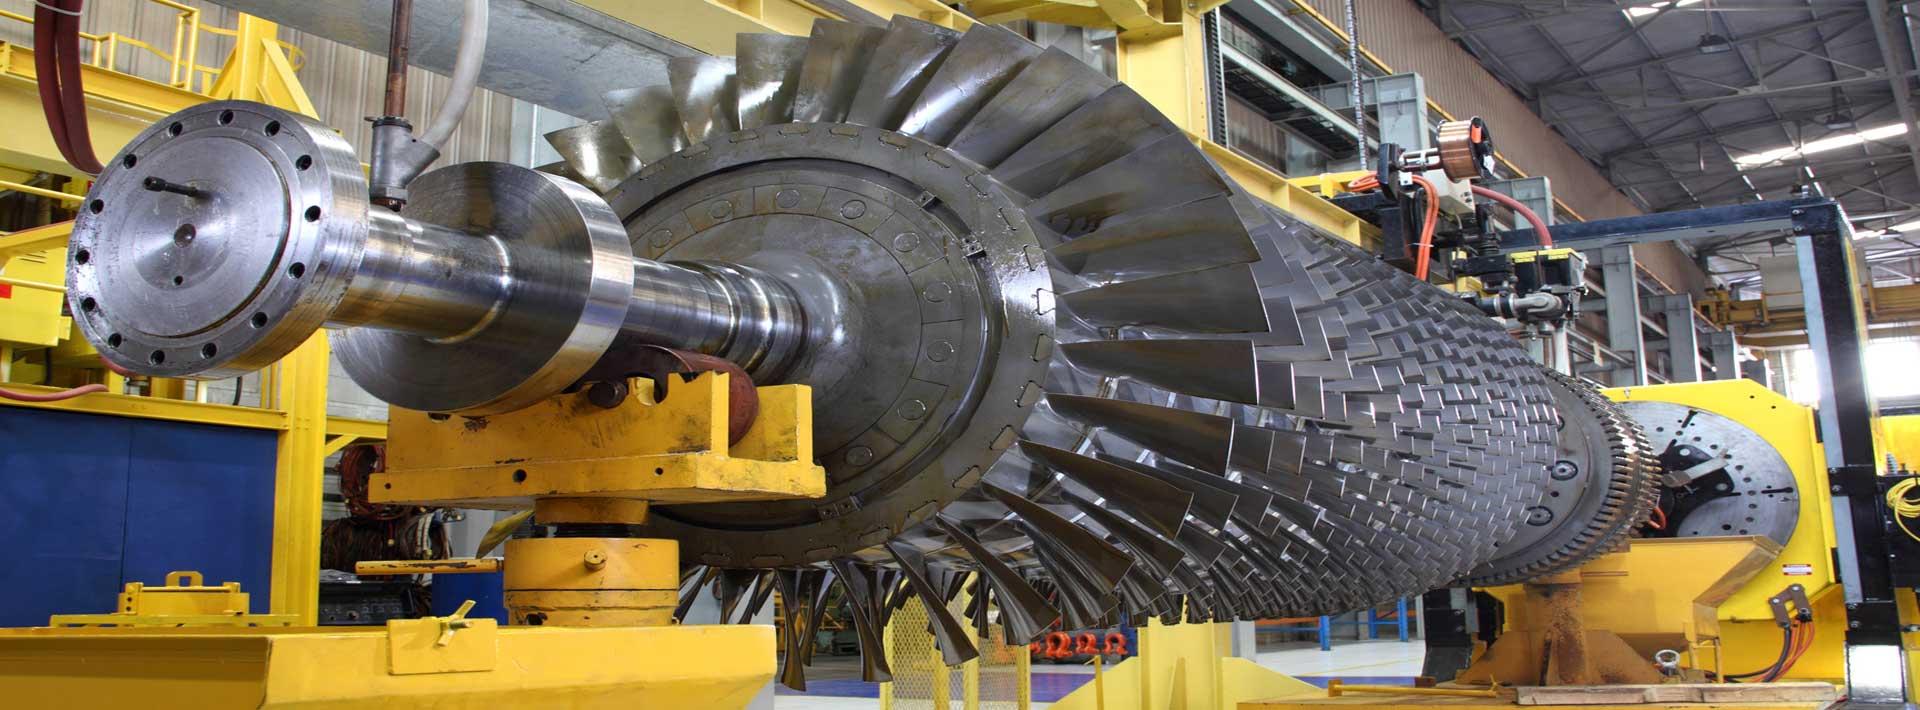 Ae Global Ltd Combined Cycle Gas Turbine Ccgt